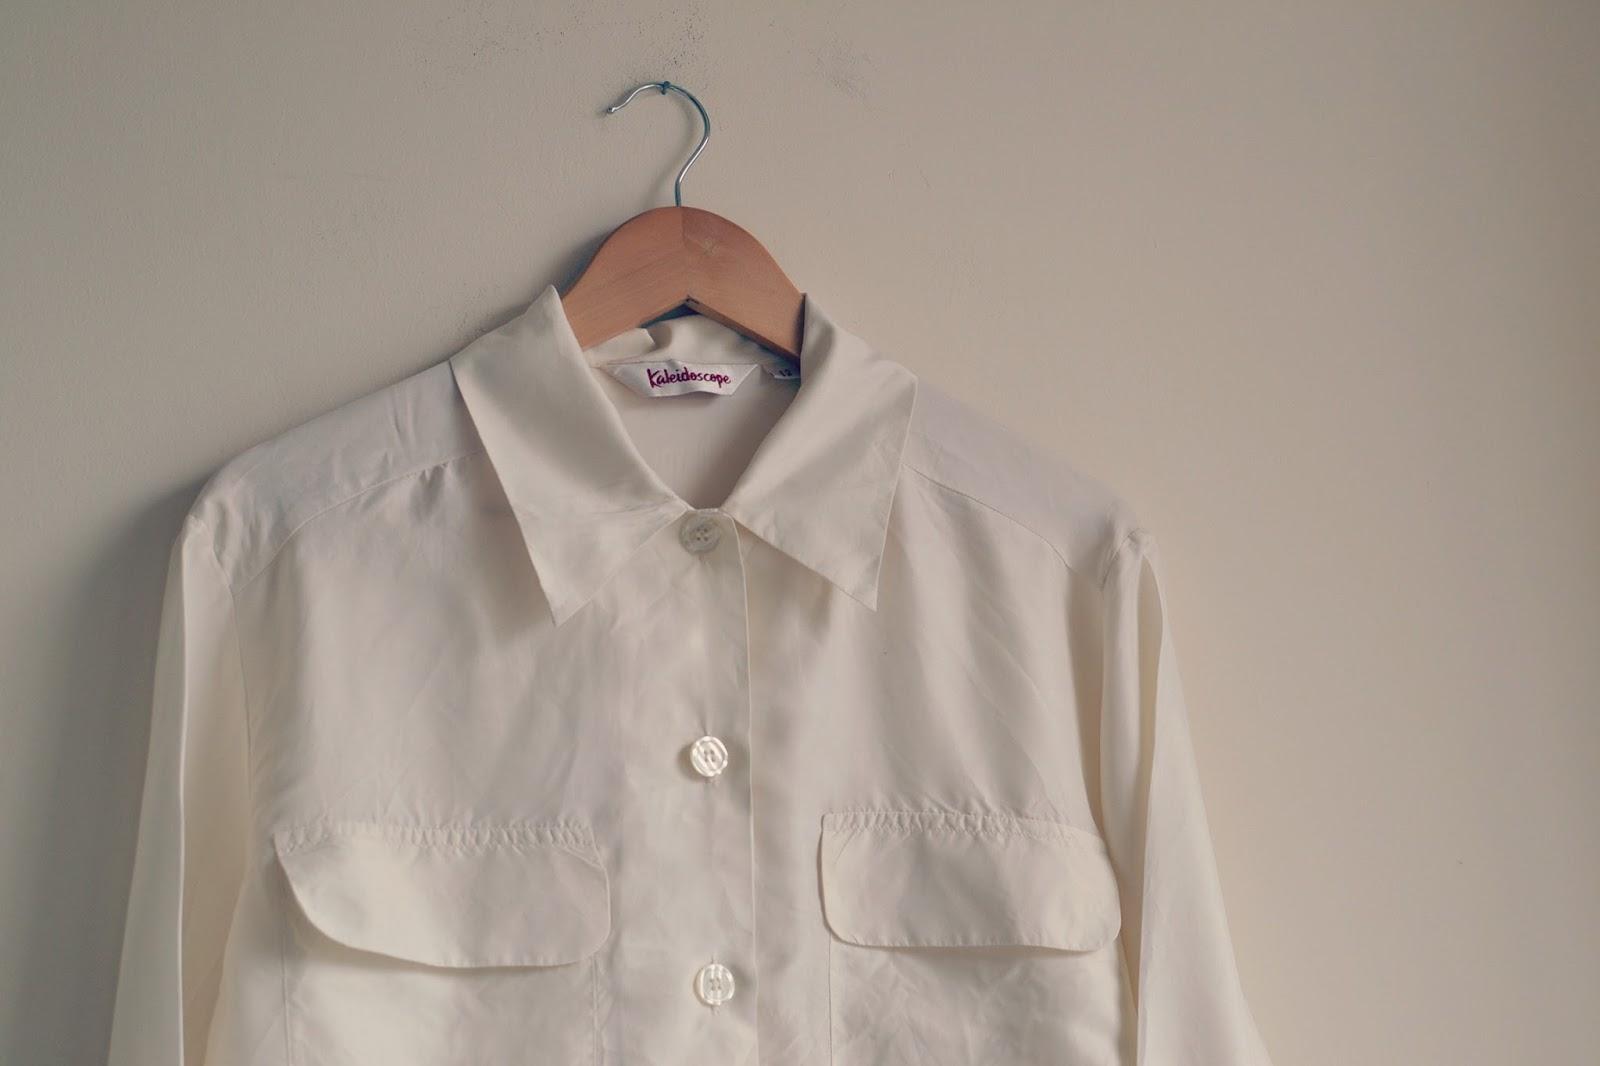 Vintage Silk Shirt Bristol Textile Recyclers